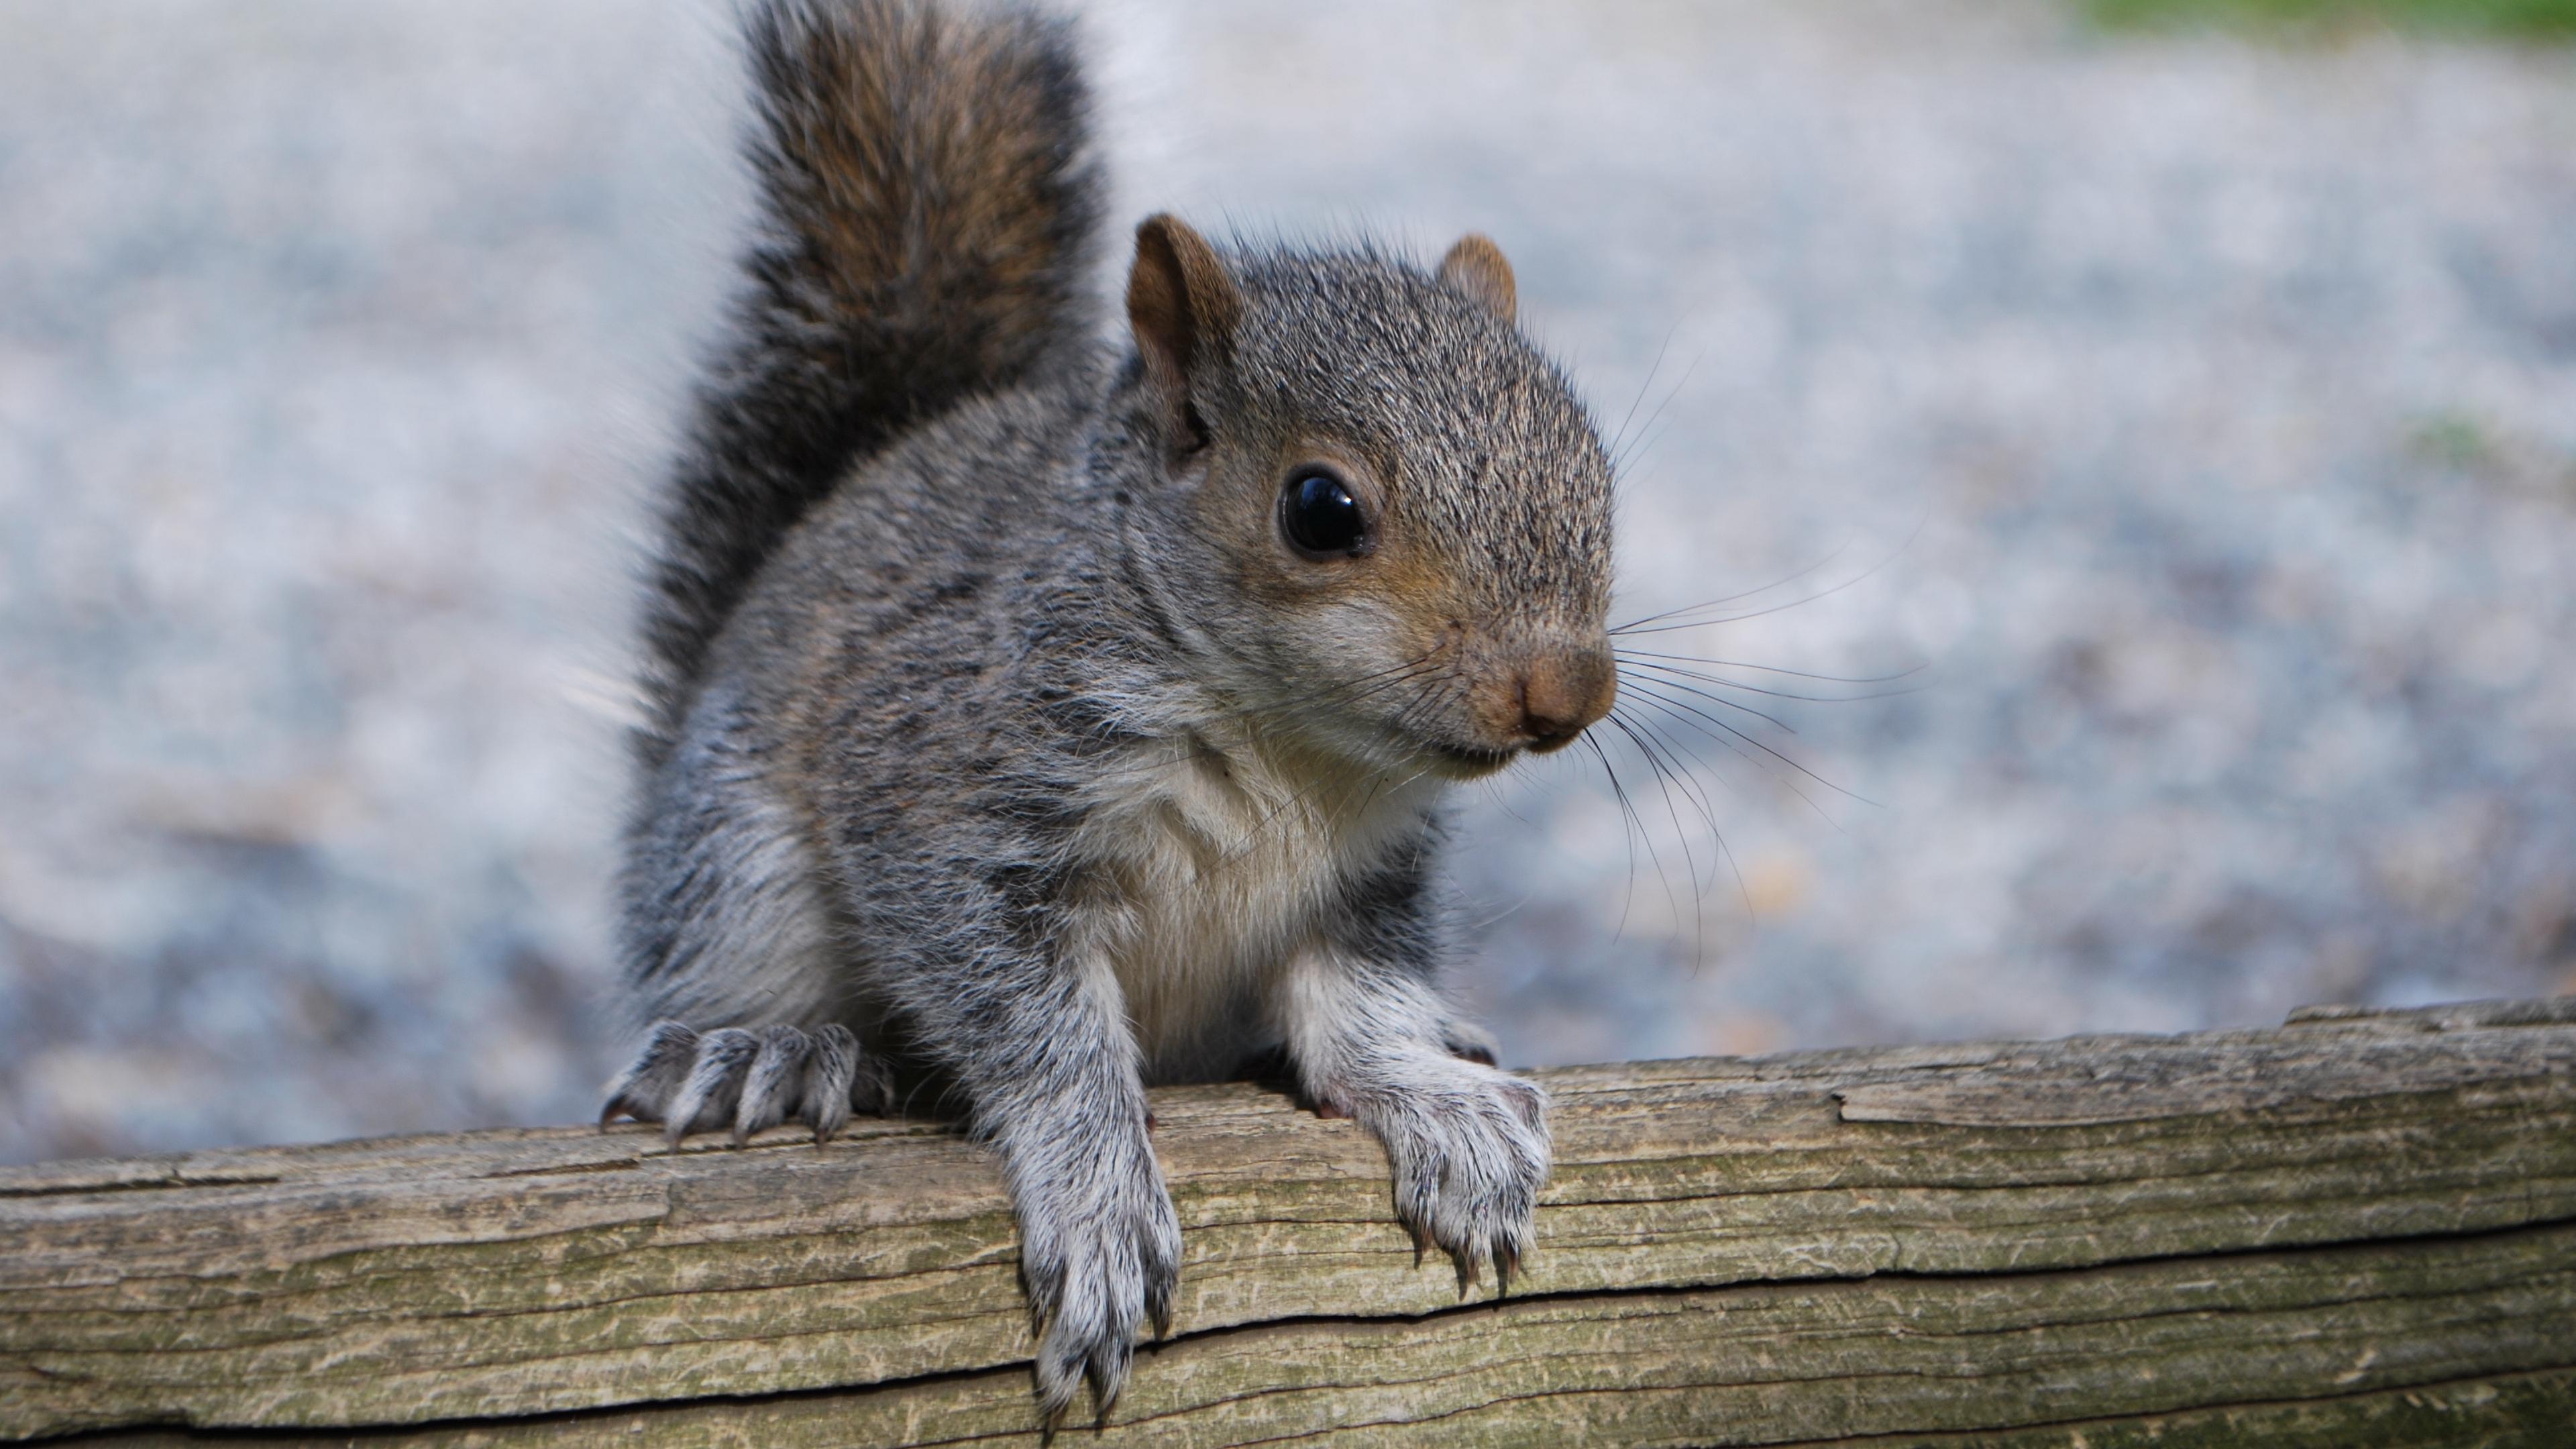 squirrel rodent timber 4k 1542241495 - squirrel, rodent, timber 4k - timber, Squirrel, rodent